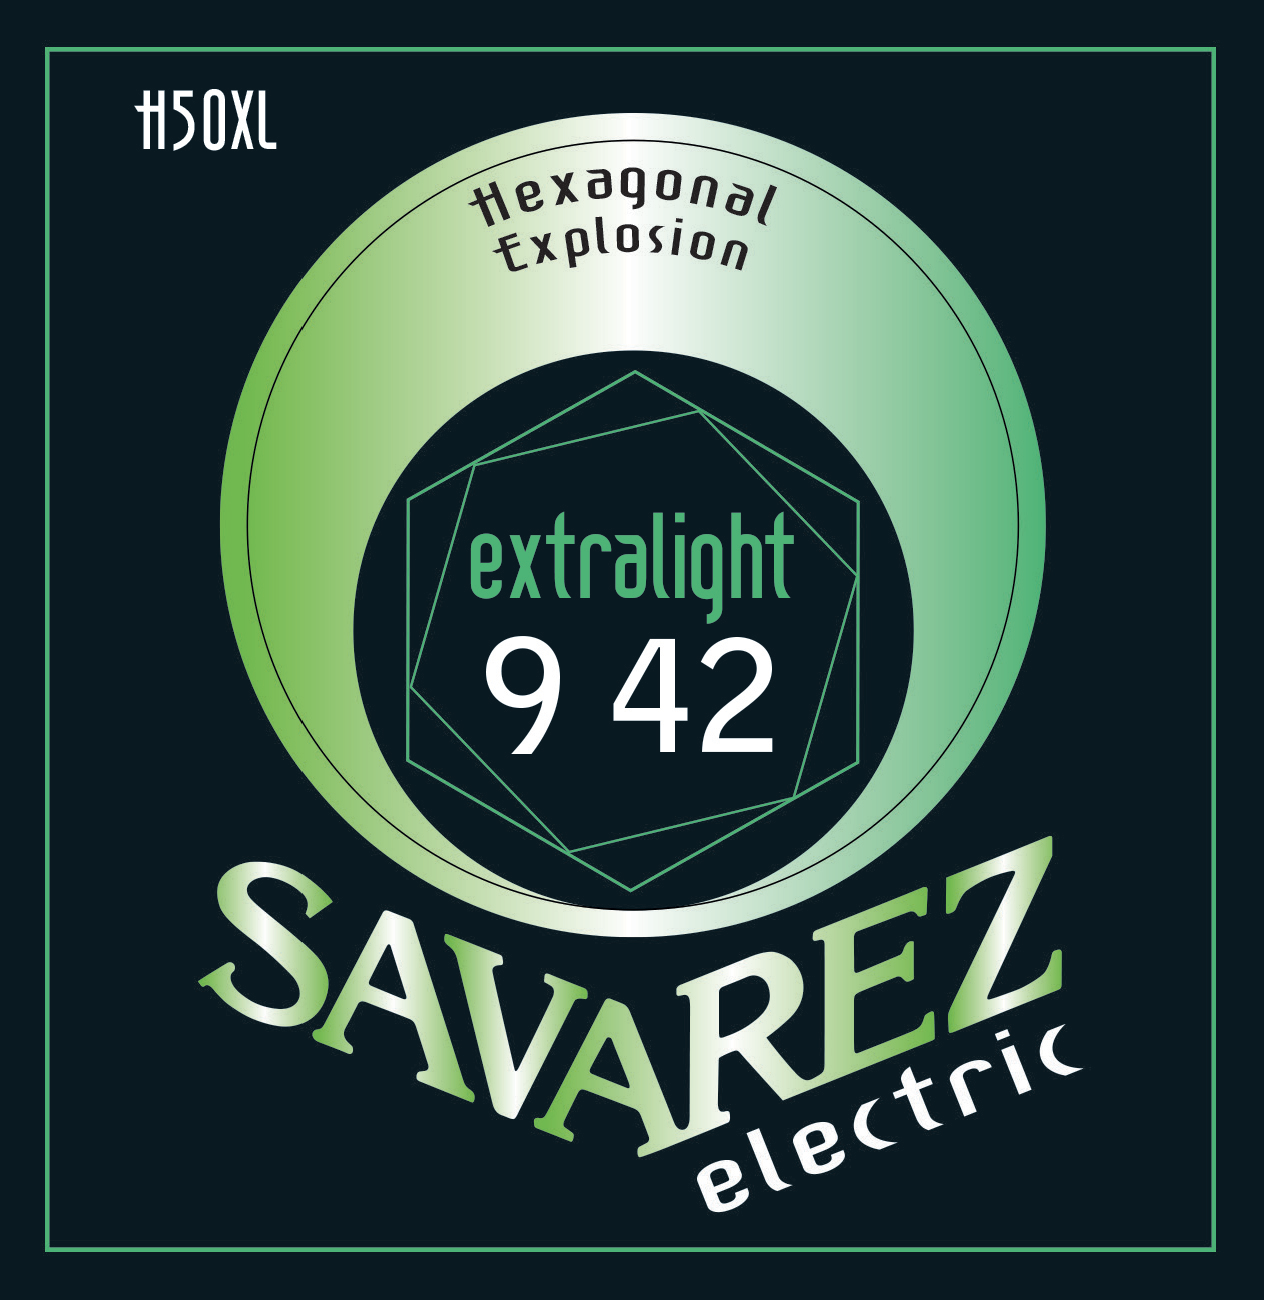 SAVAREZ ELECTRIC HEXAGONAL EXPLOSION H50XL